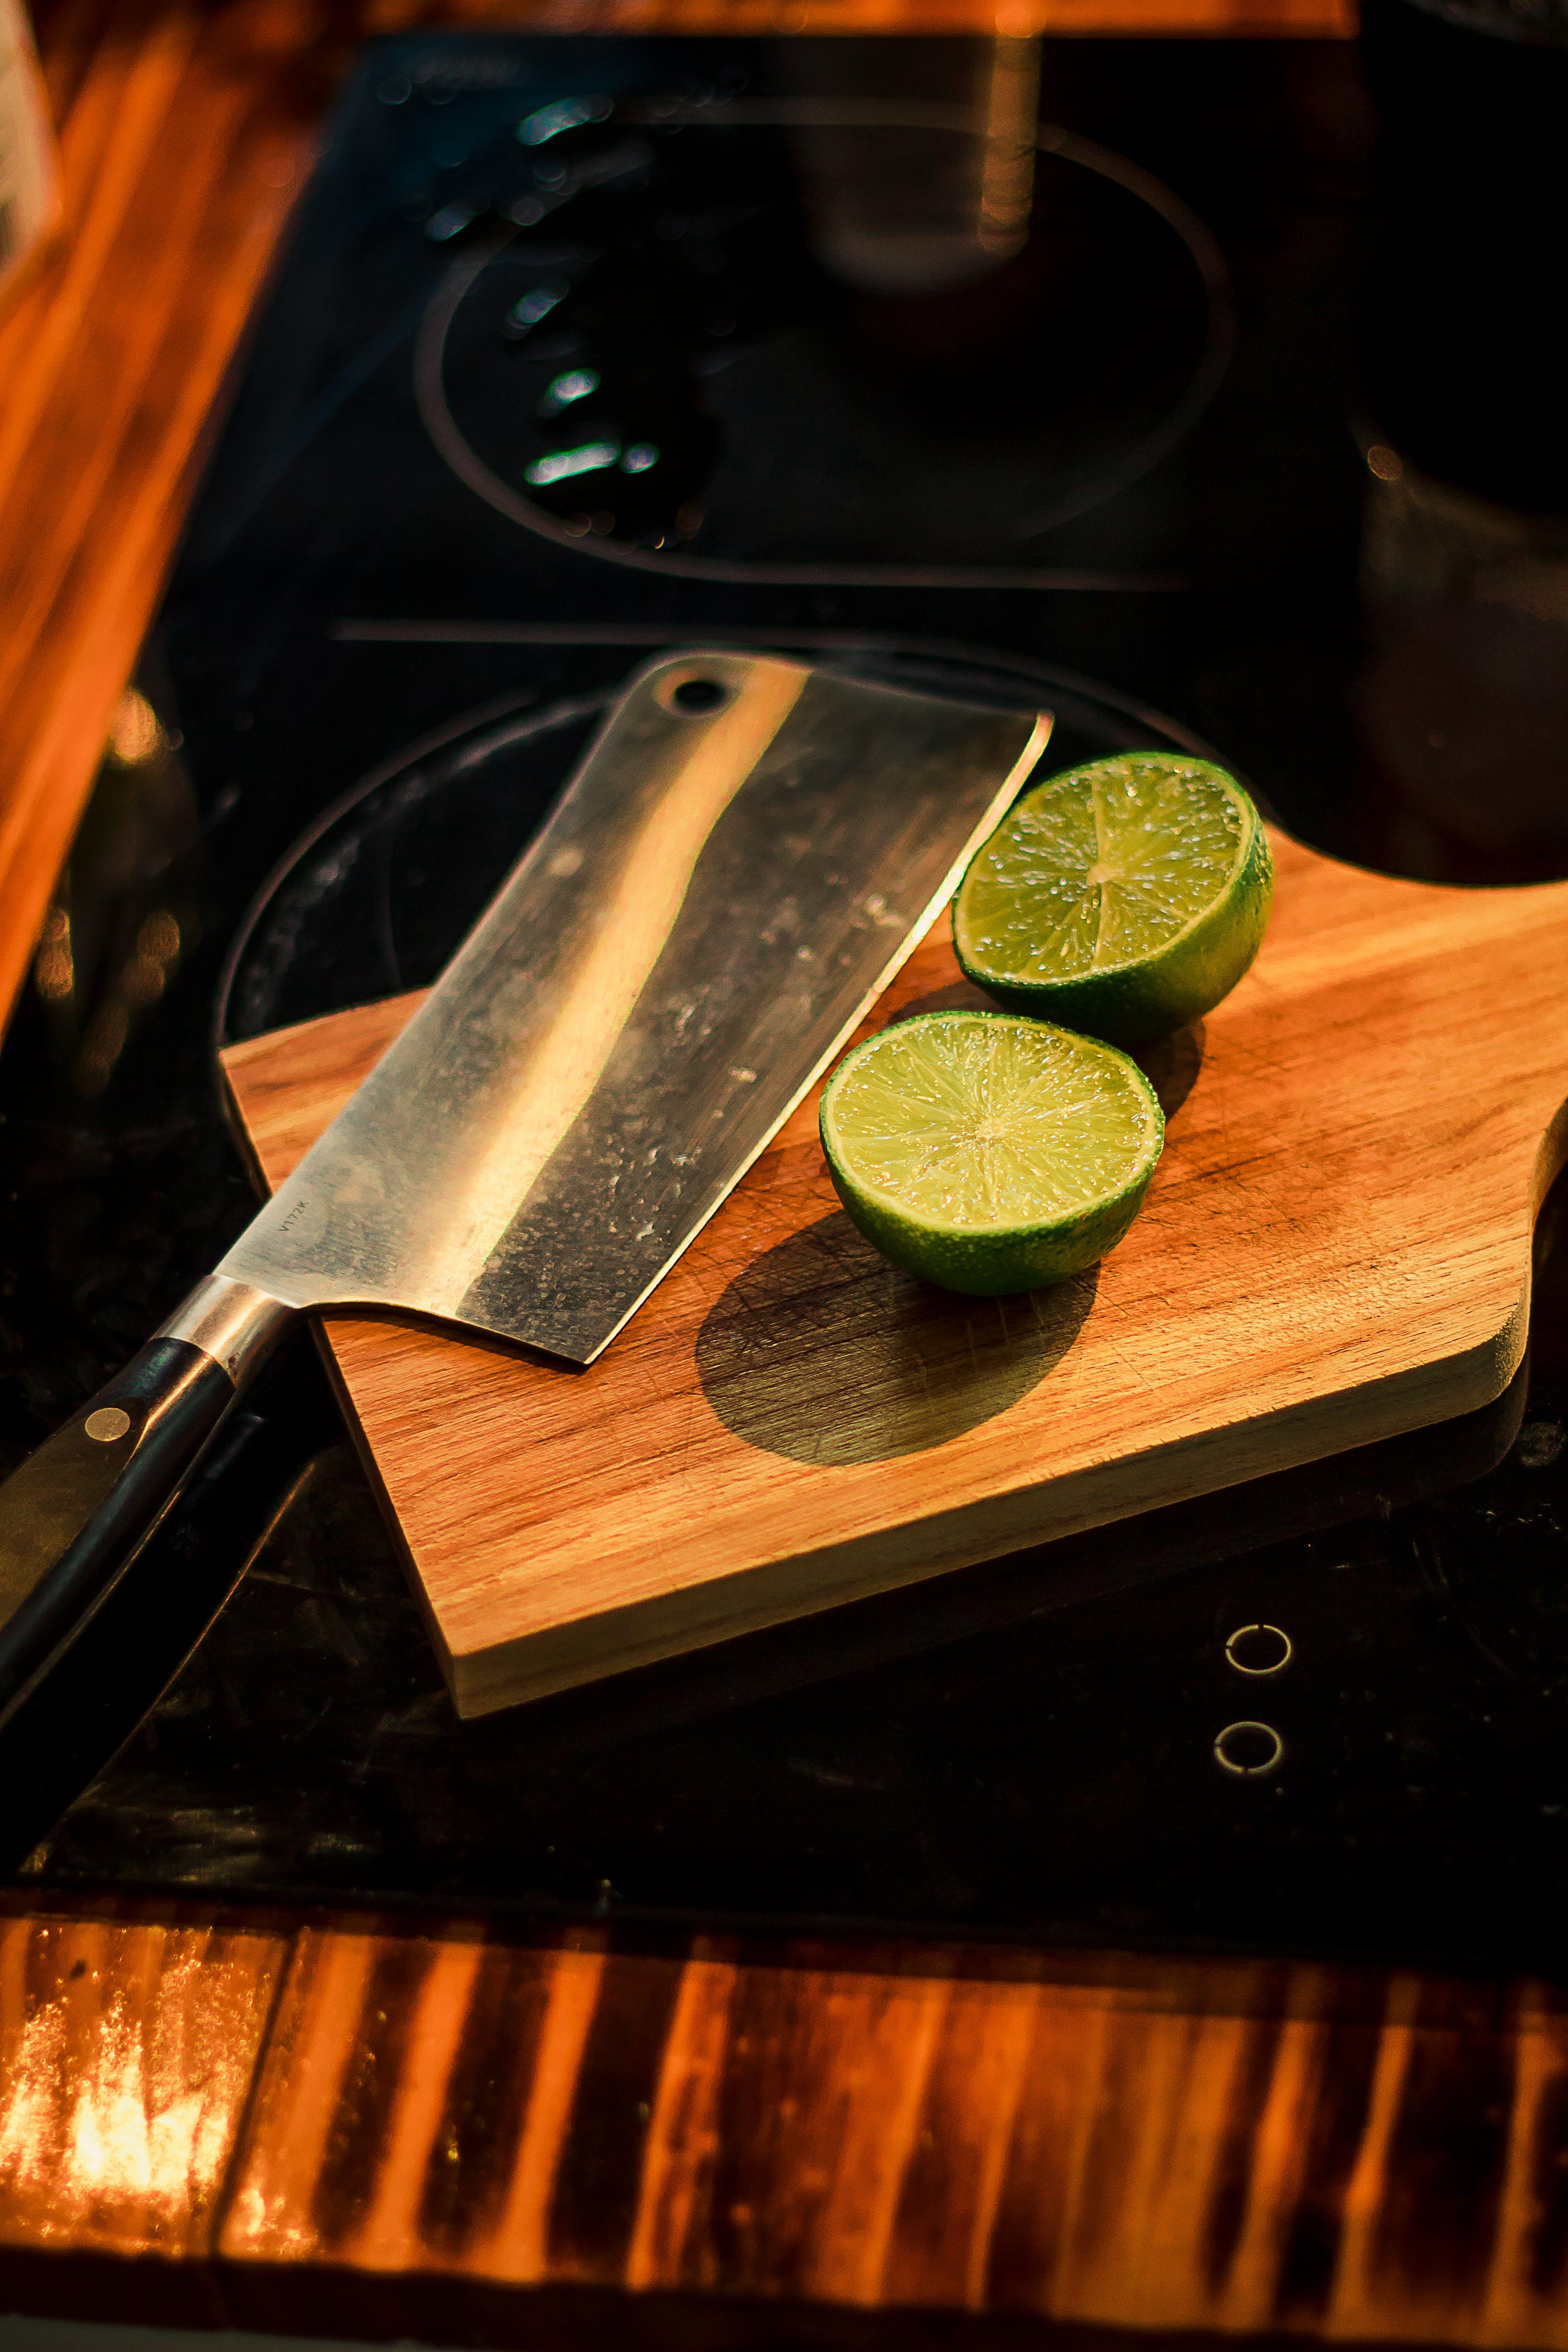 Sliced Lemons on Brown Wooden Chopping Board